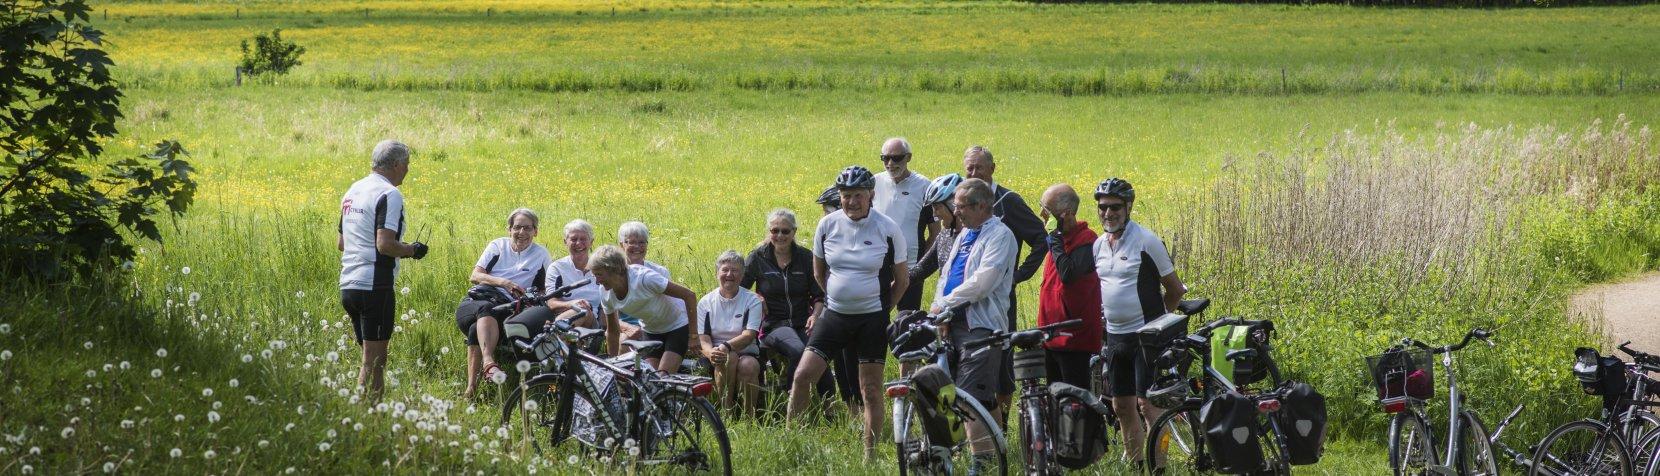 Foto: RudersdalRutens Univers - cyklister på tur holder pause